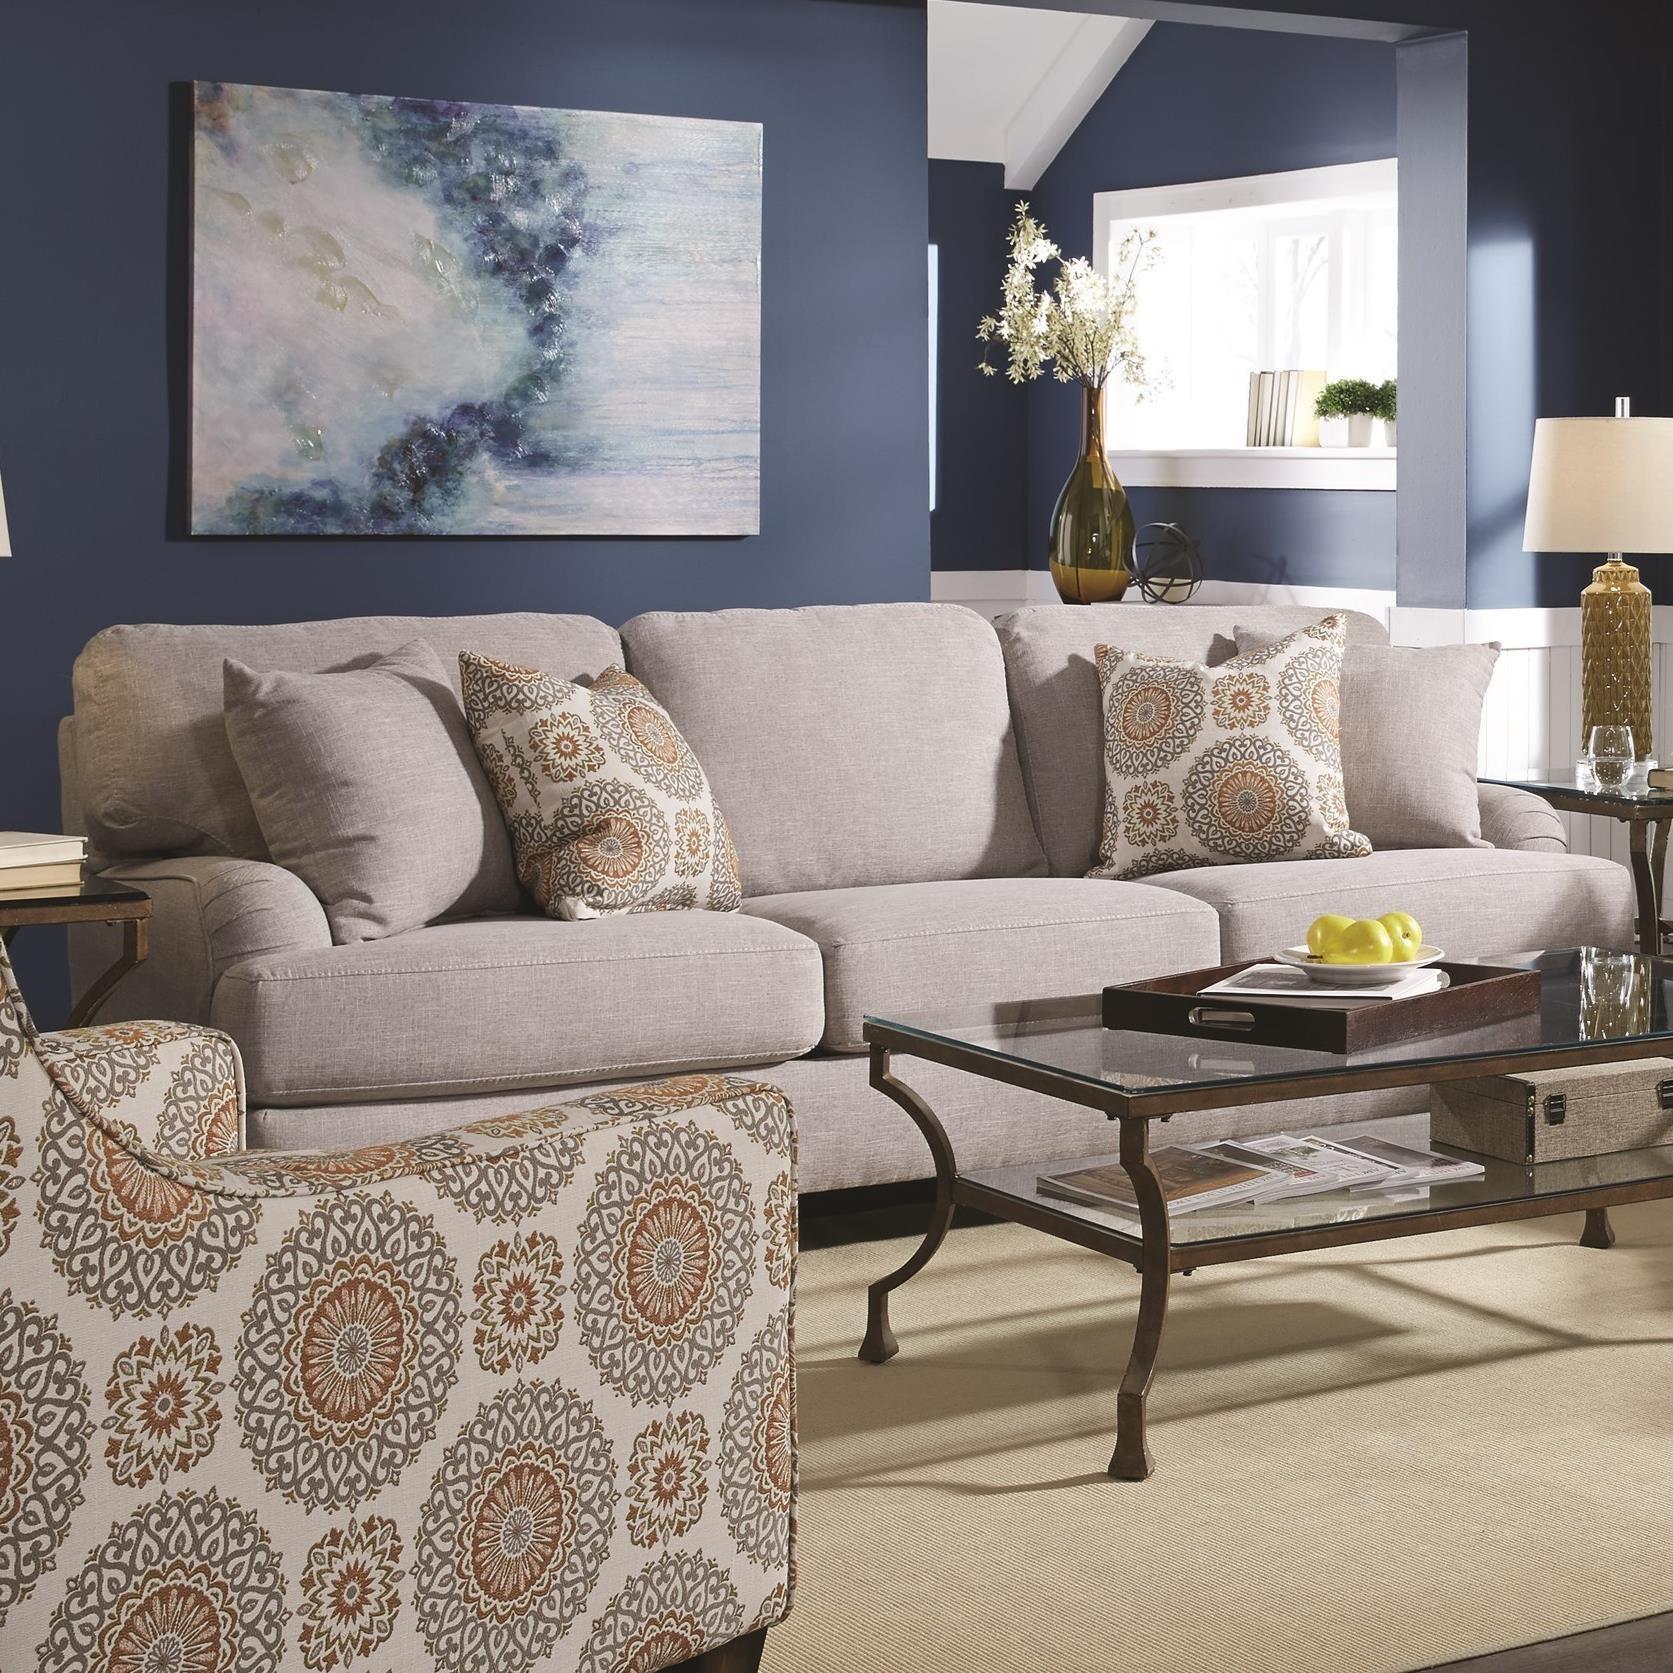 Brianna Sofa by Franklin at Wilcox Furniture